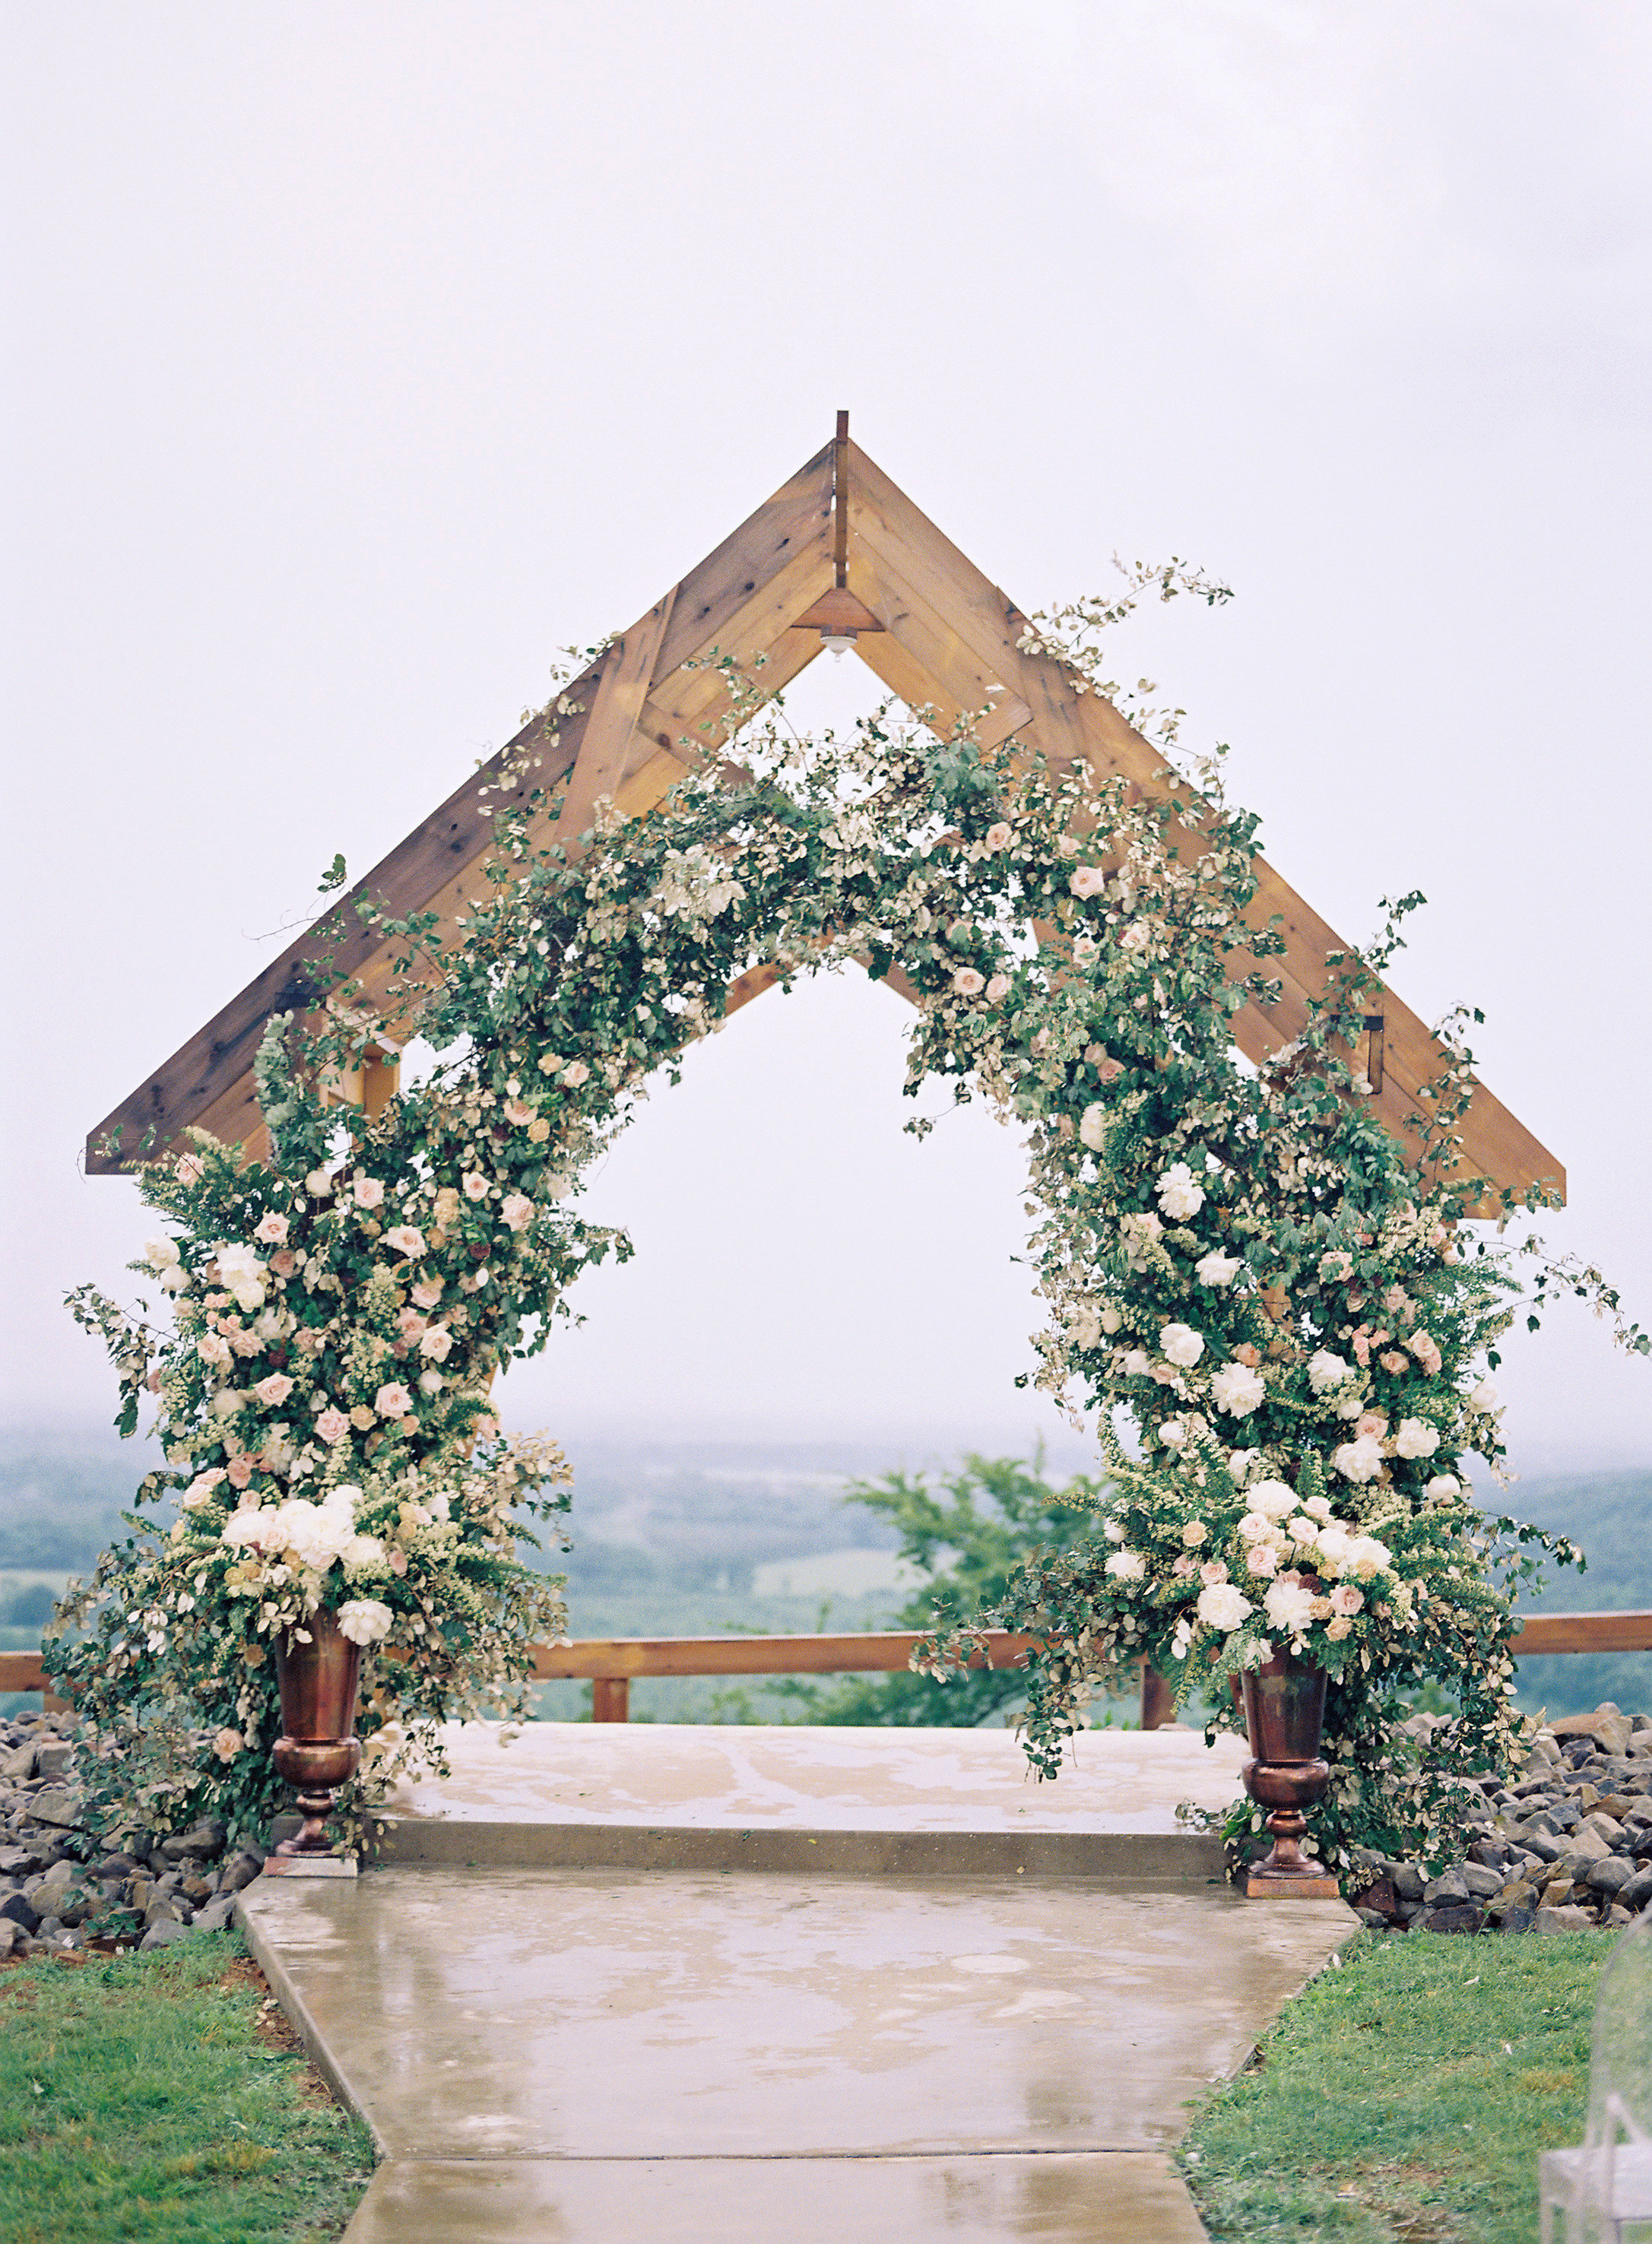 jessica-zimmerman-events-arkansas-mountain-wedding-ceremony-arch.jpg